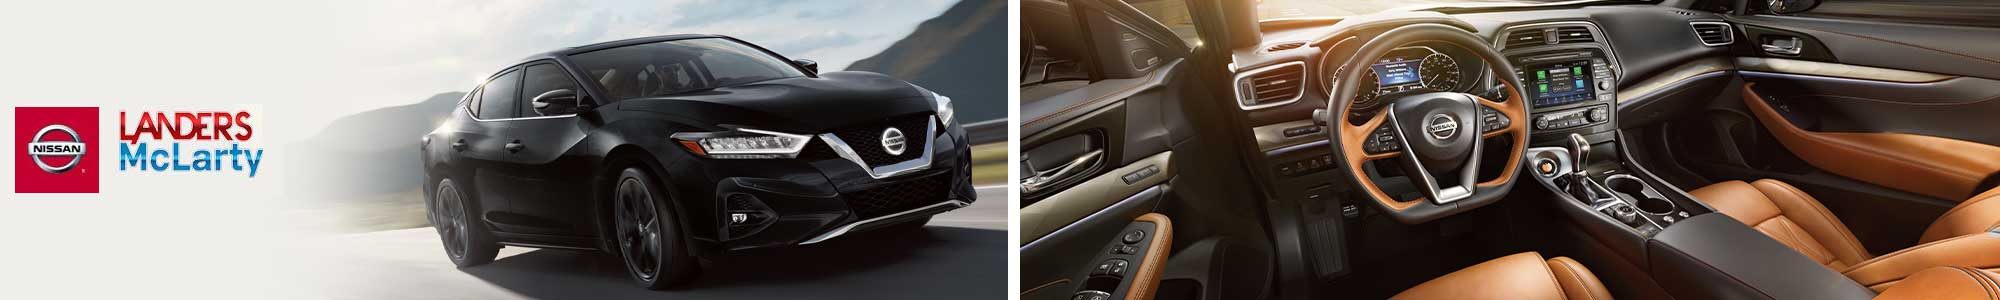 2020 Nissan Maxima Interior and Exterior